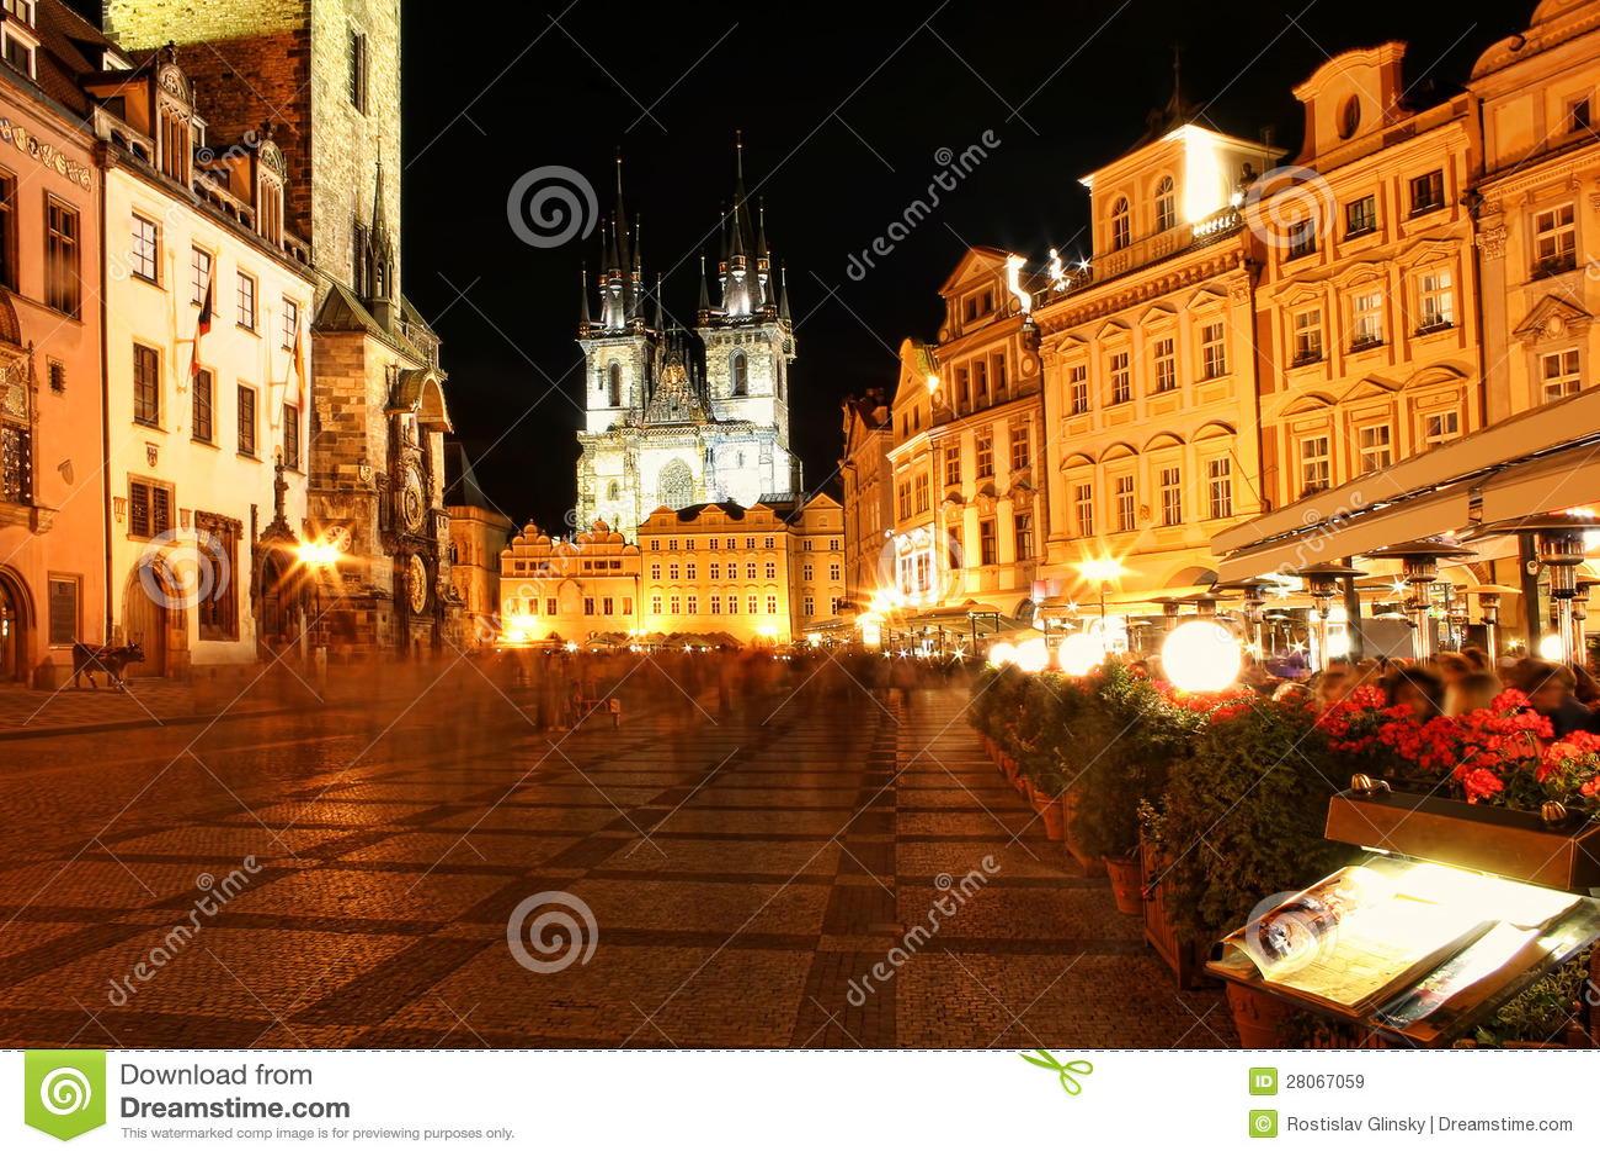 Prague city center at night royalty free stock images for Prague center